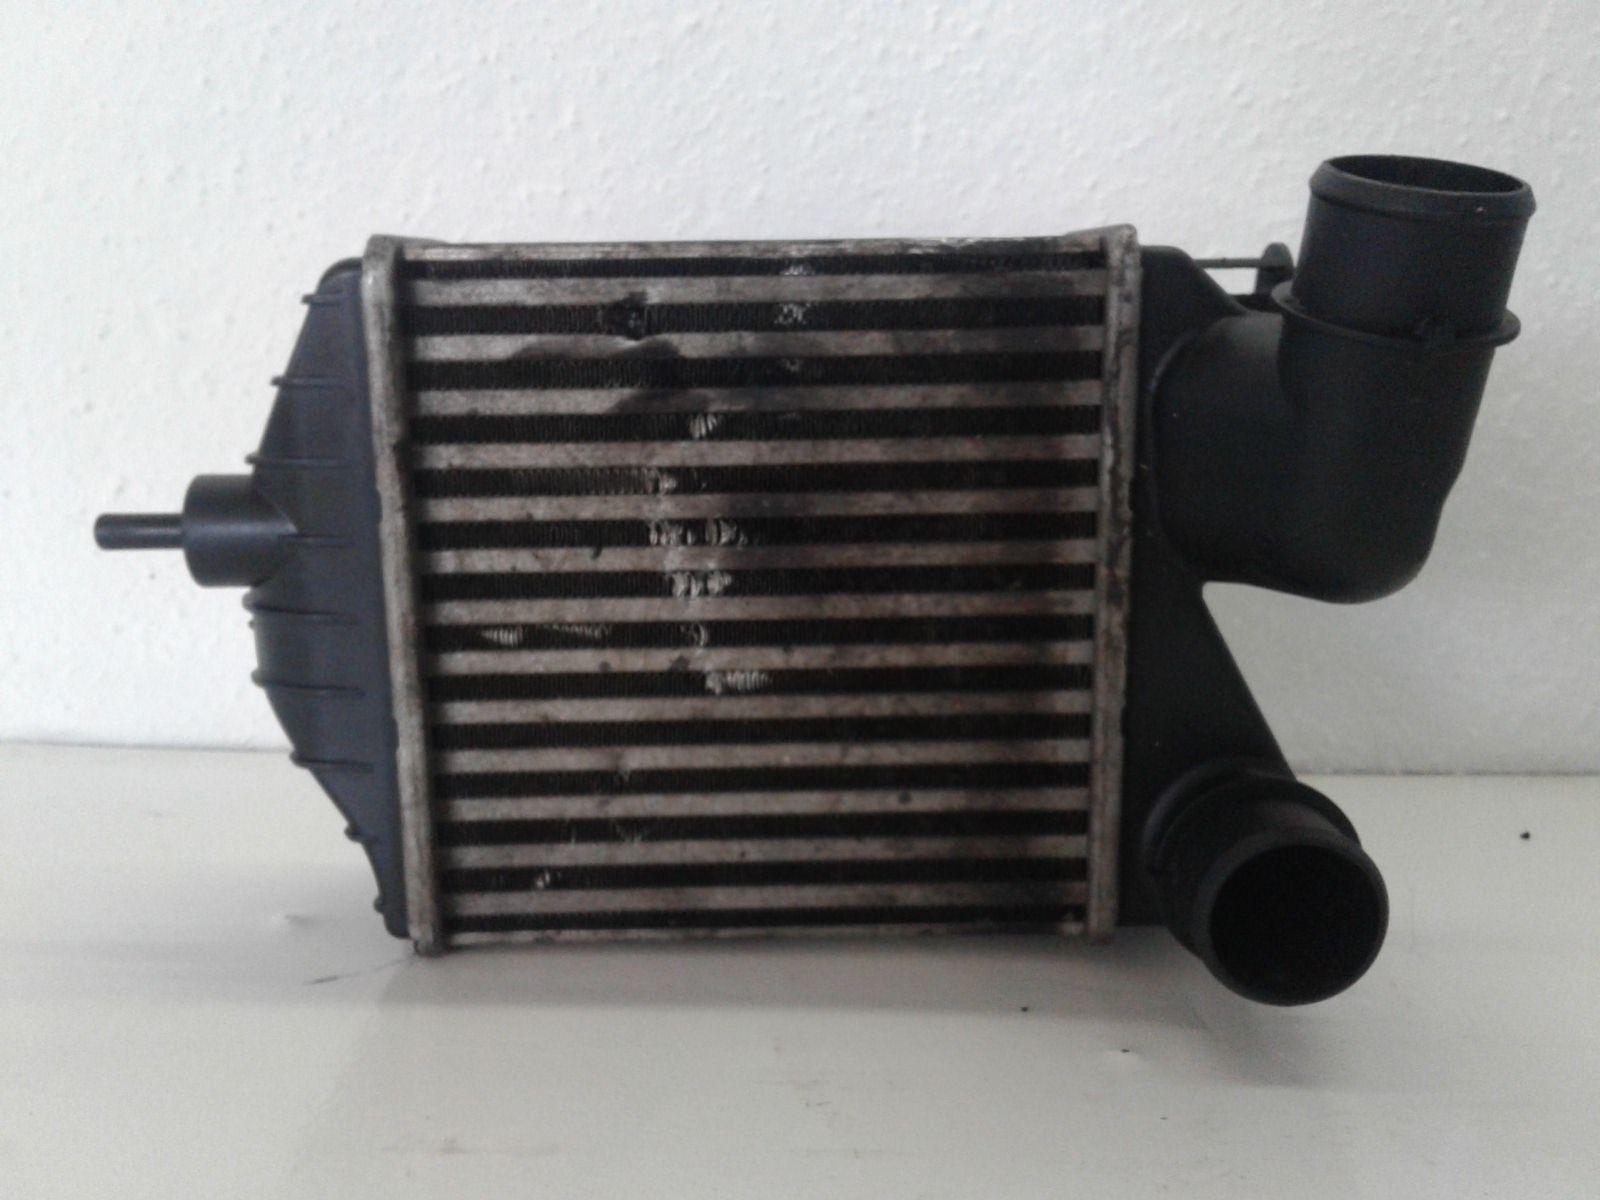 INTERCOOLER FIAT Idea 2° Serie 1900 Diesel (2006) RICAMBI USATI